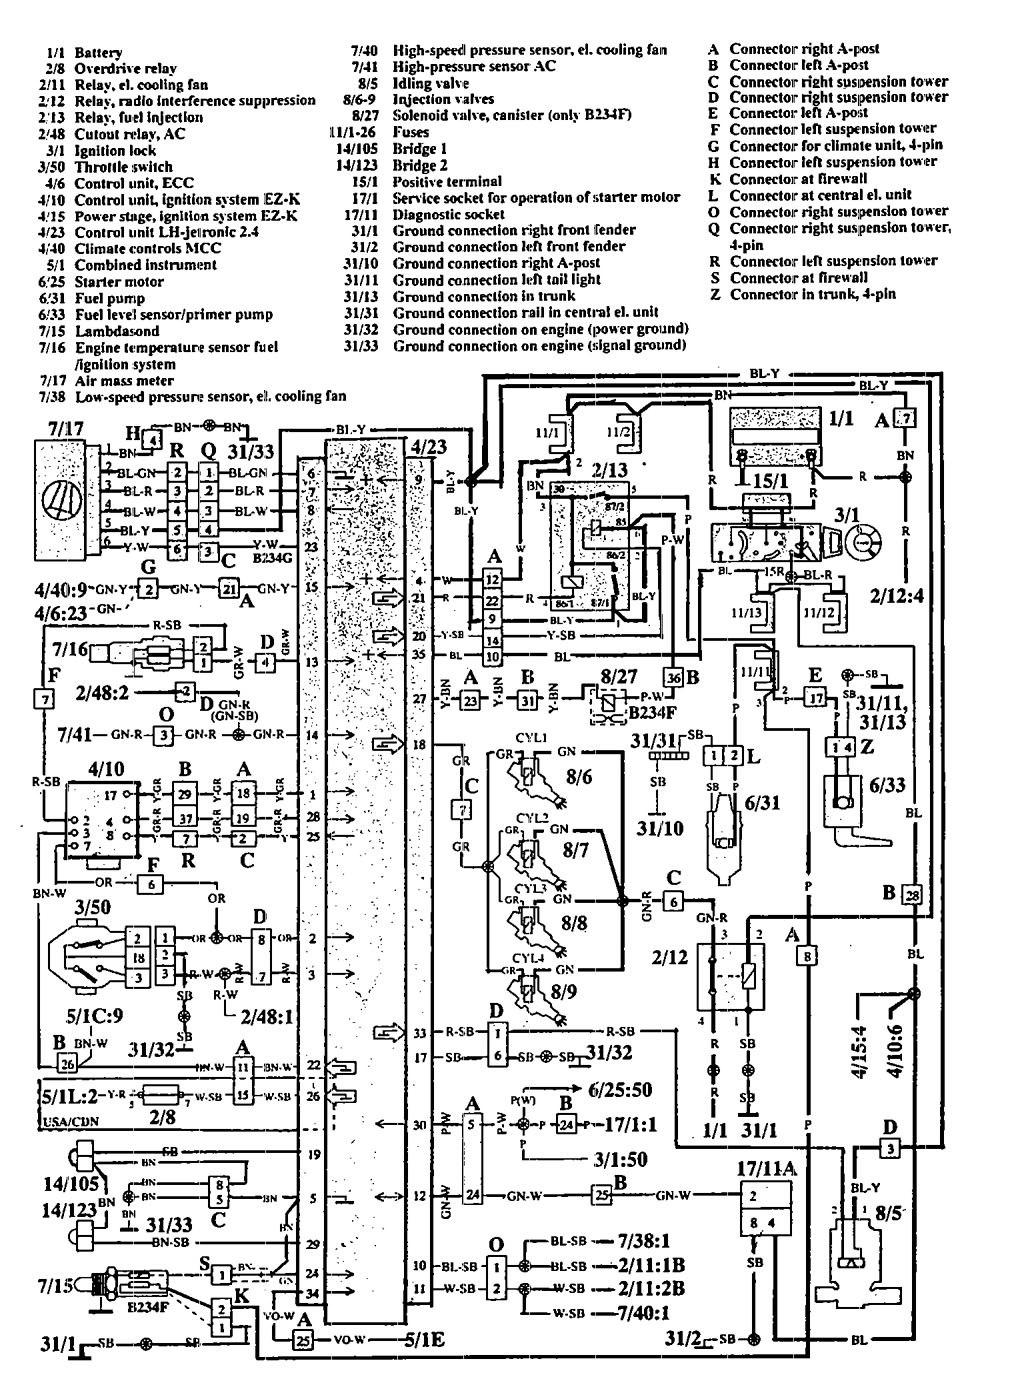 Radio Wiring Diagram Volvo 940 Modern Design Of 1995 960 Diagrams Rh 38 Jennifer Retzke De 240 1993